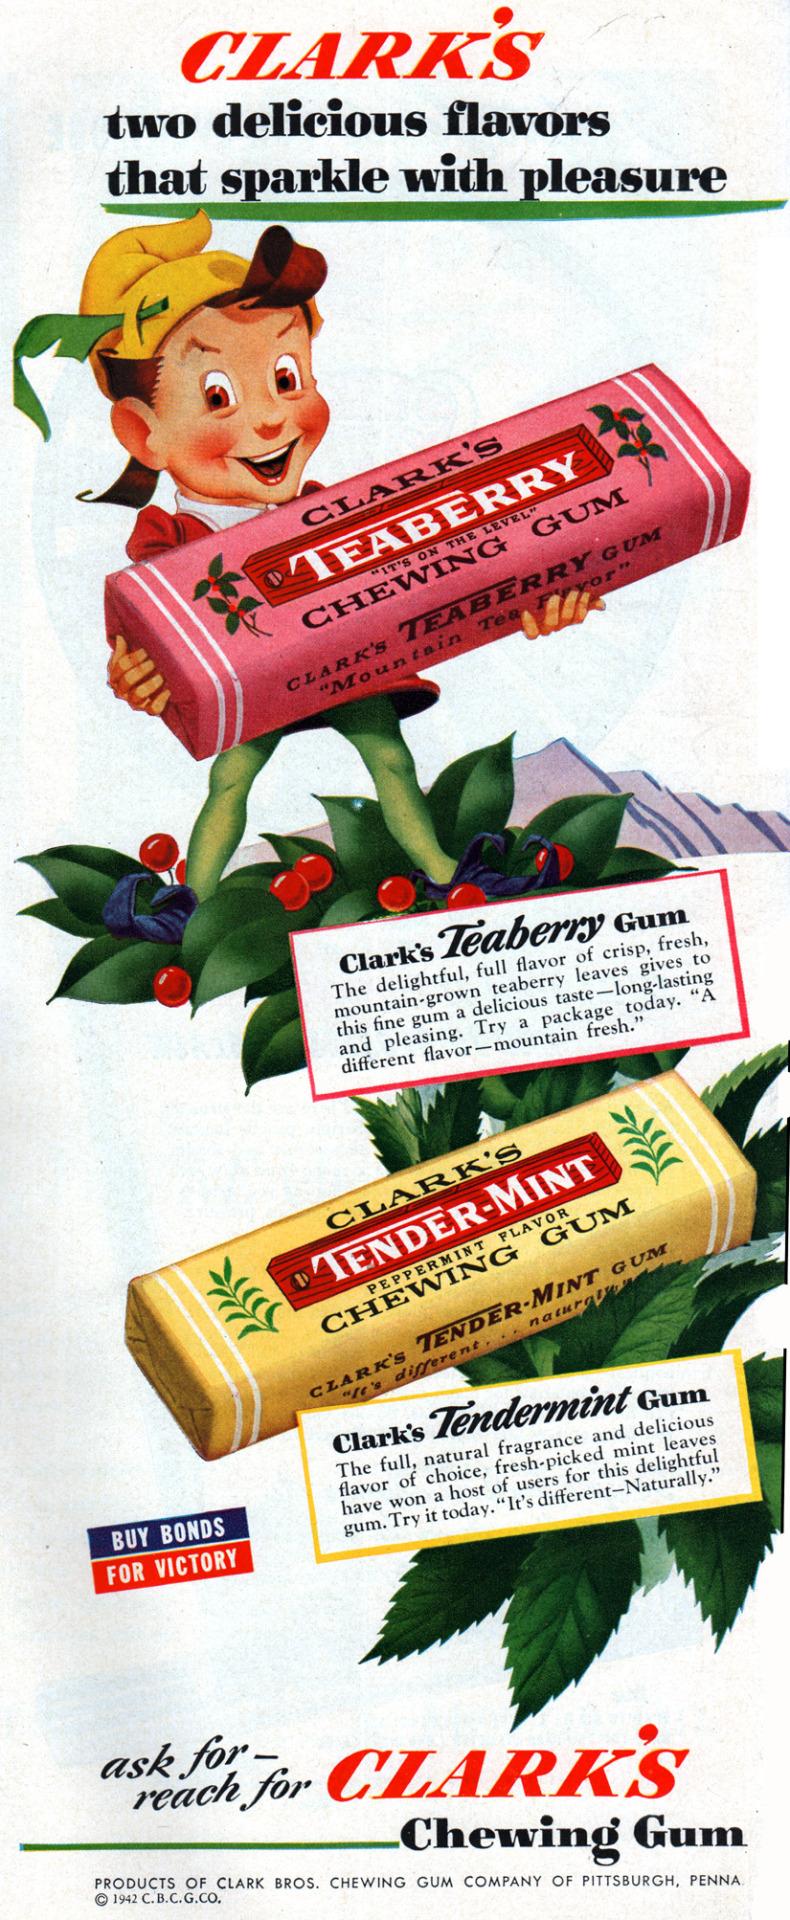 Clark's Chewing Gum - 1942